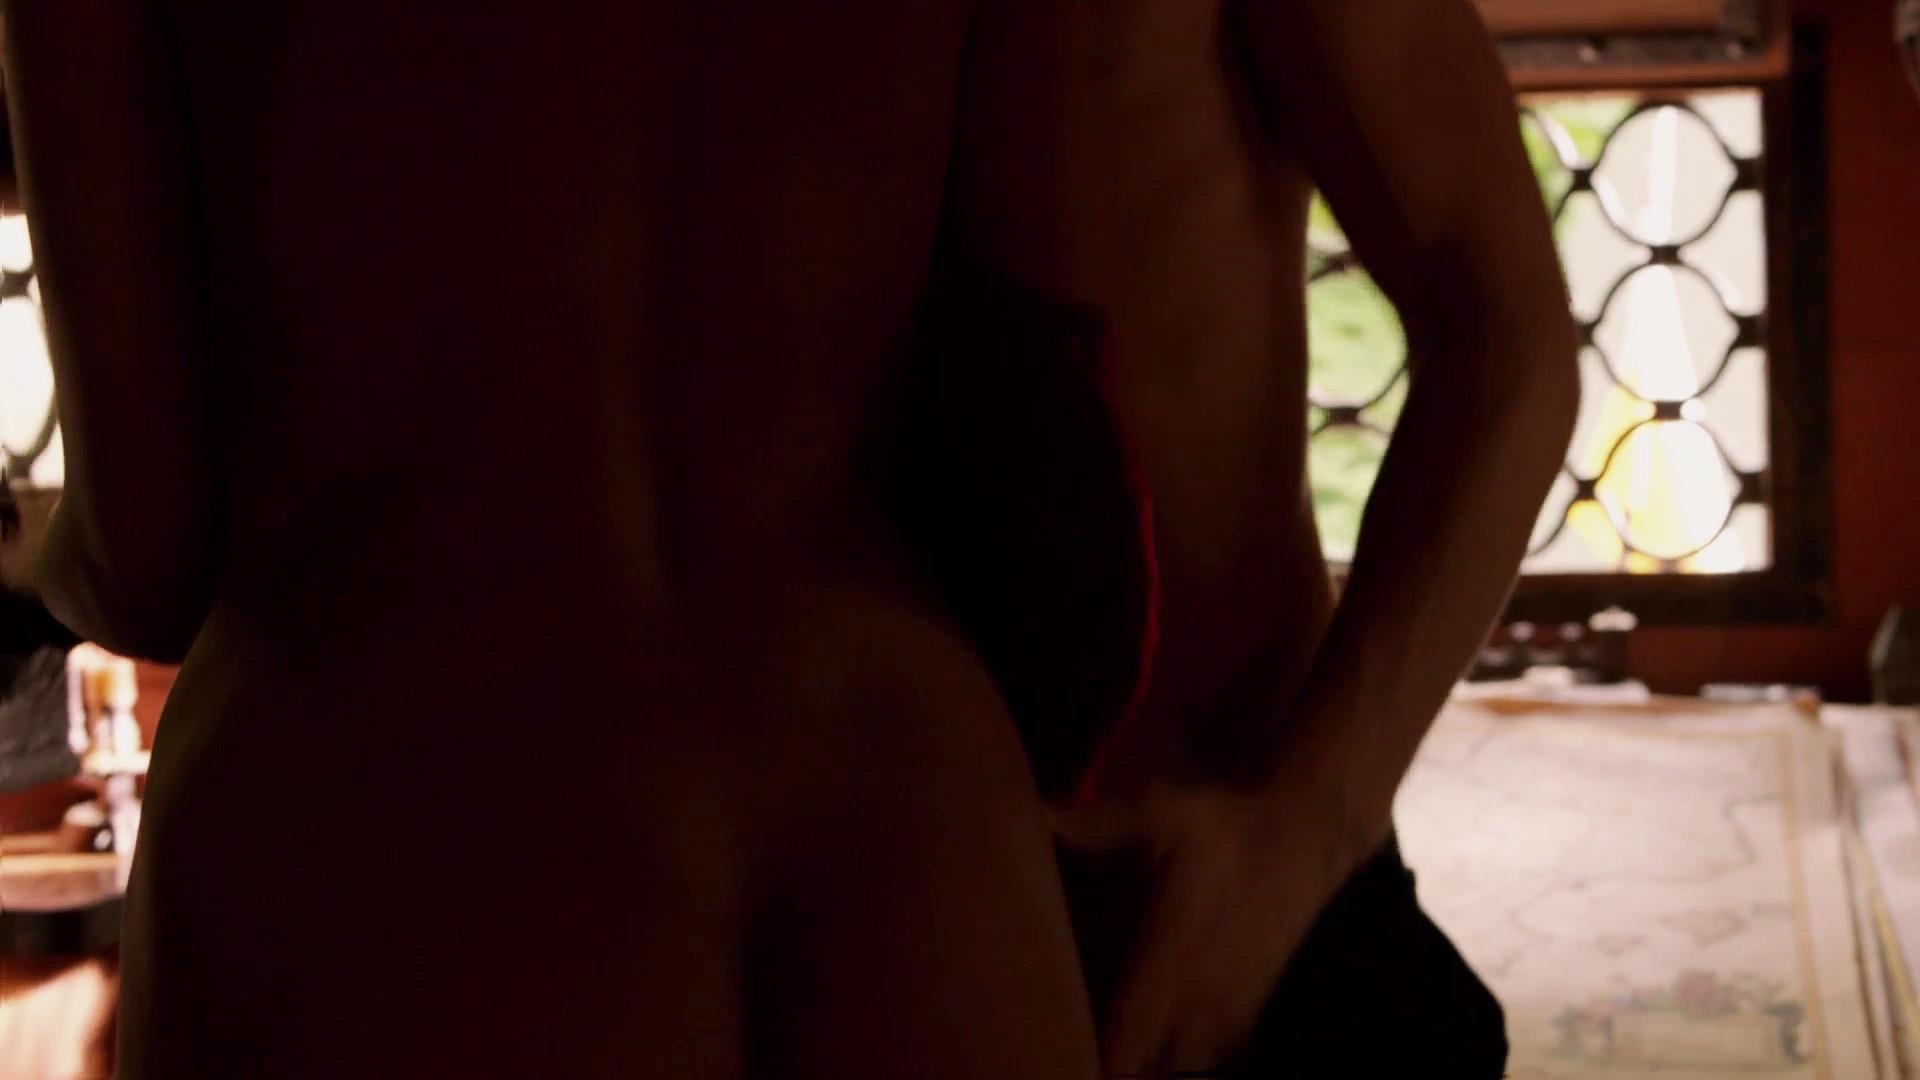 Famke janssen sexy topless nudes (69 photos), Topless Celebrity fotos